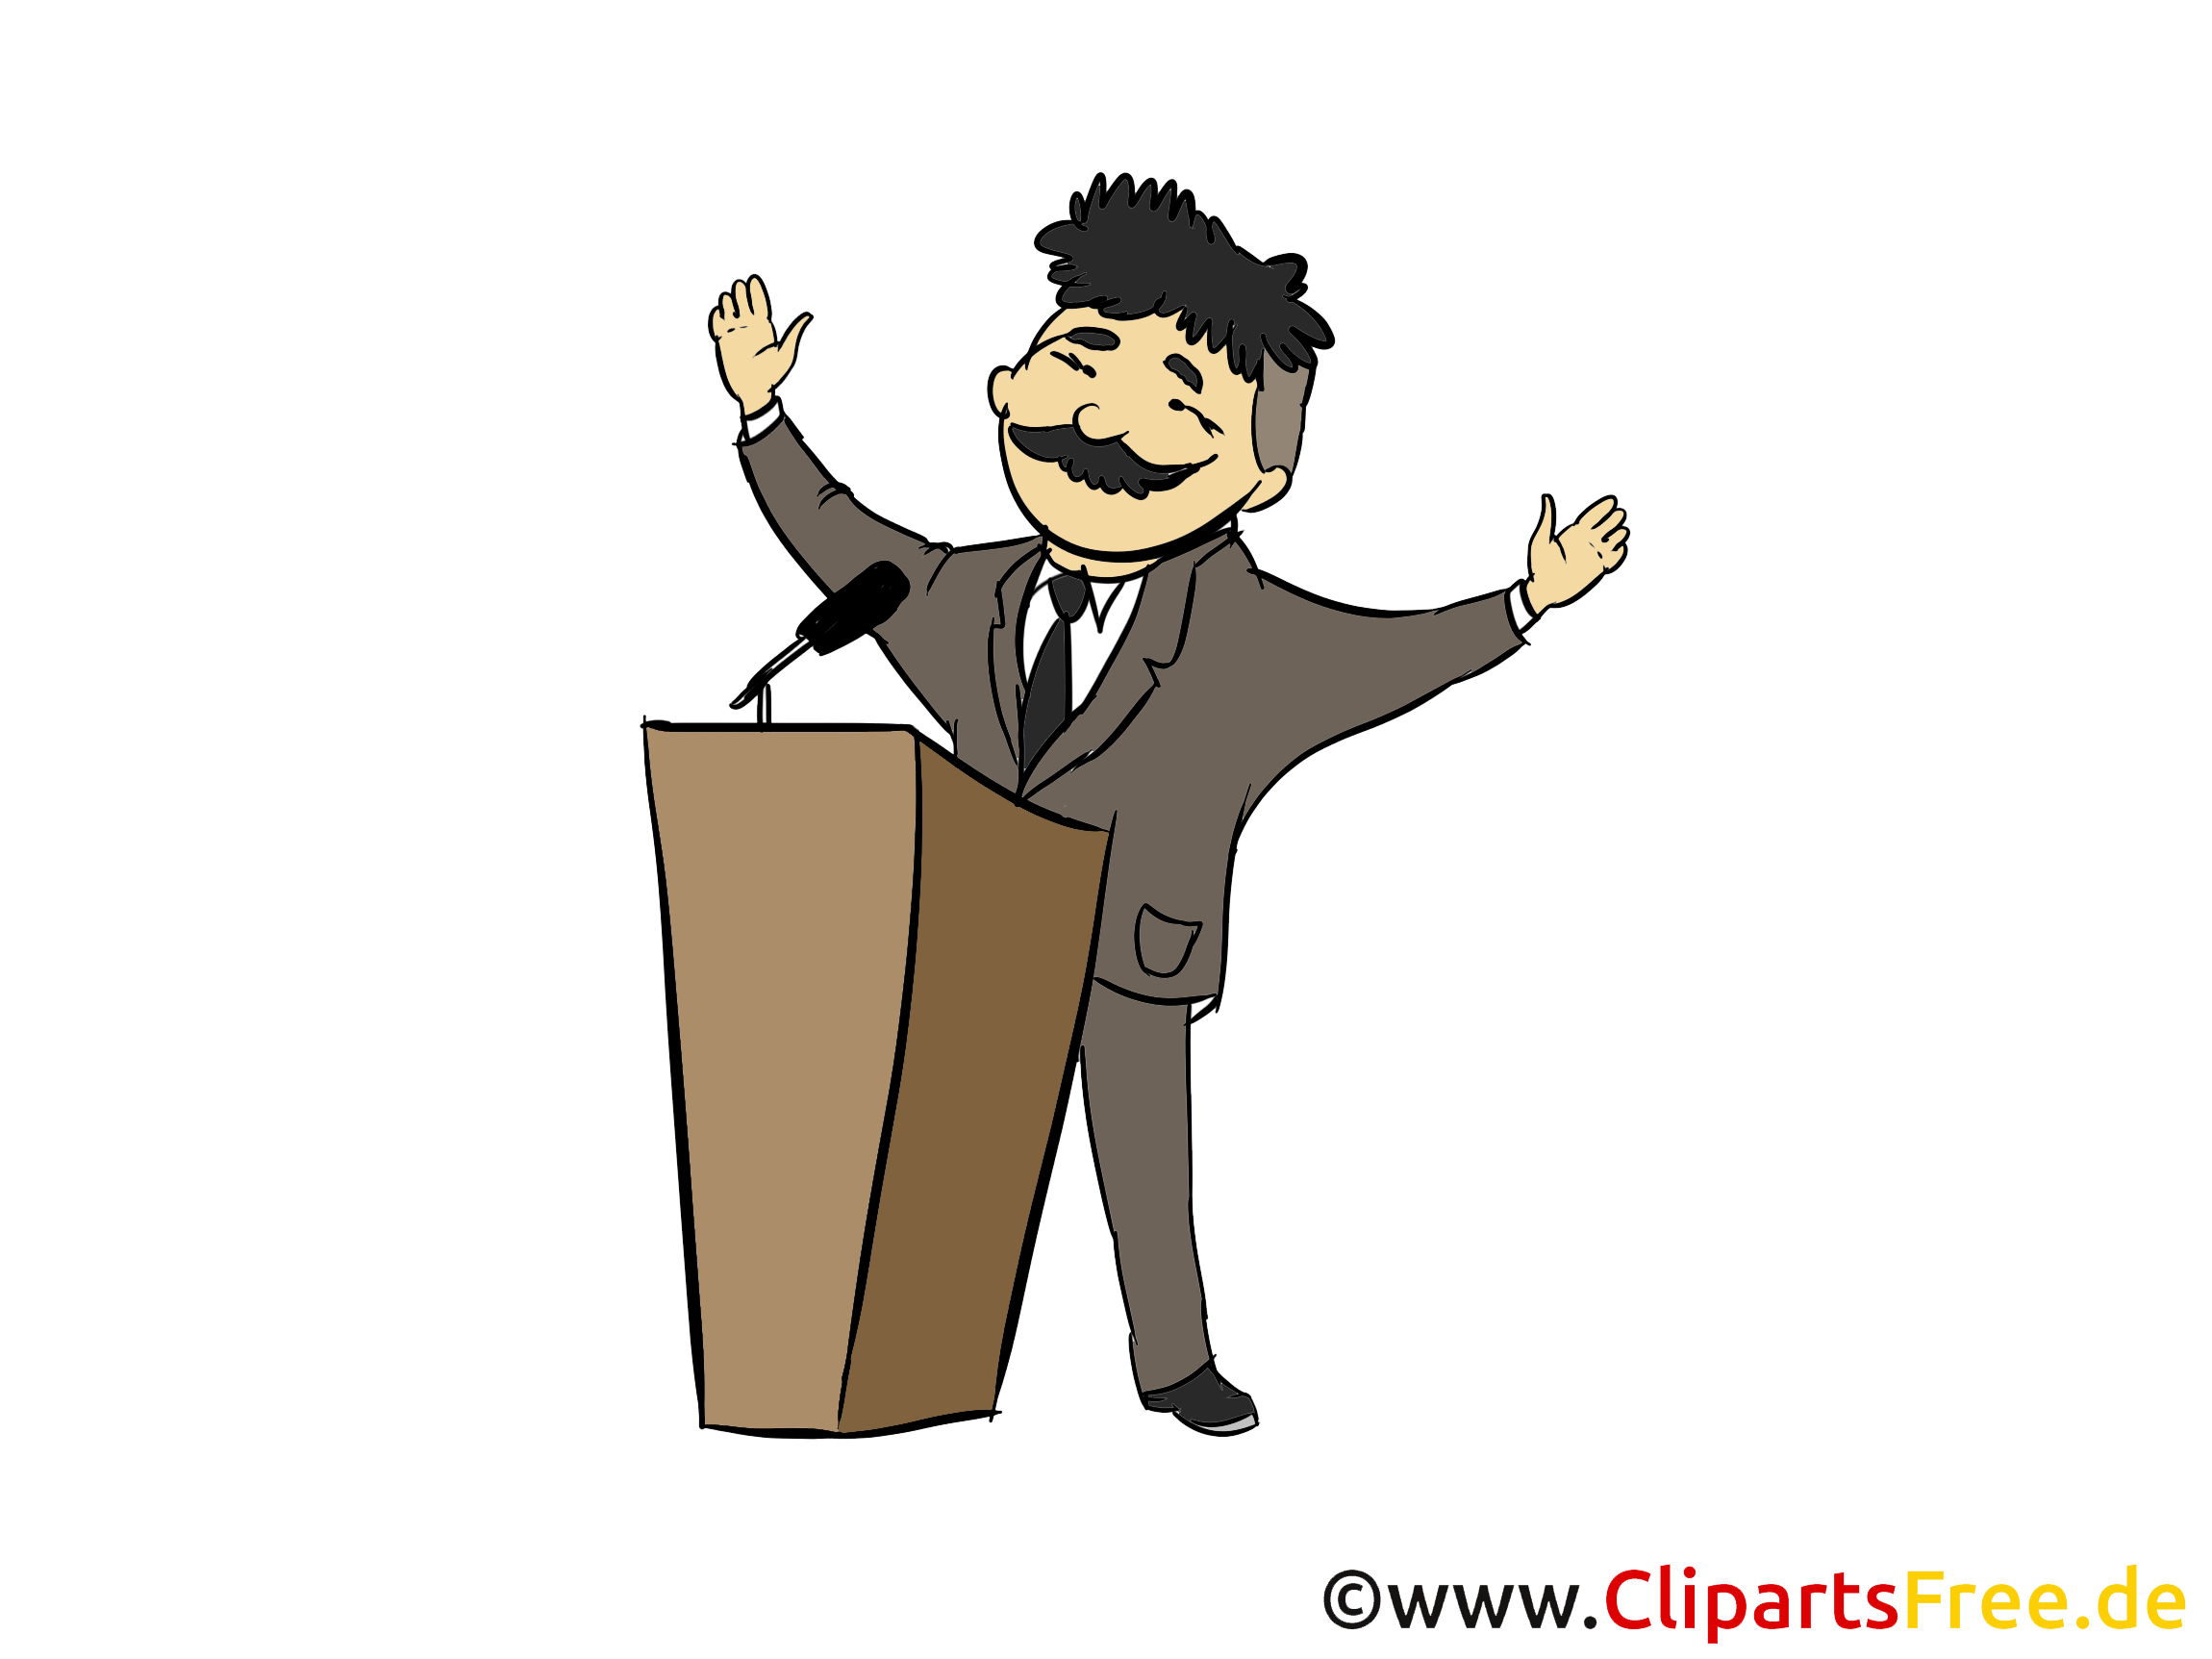 Wahlen Bild, Clipart, Grafik, Cartoon, Illustration